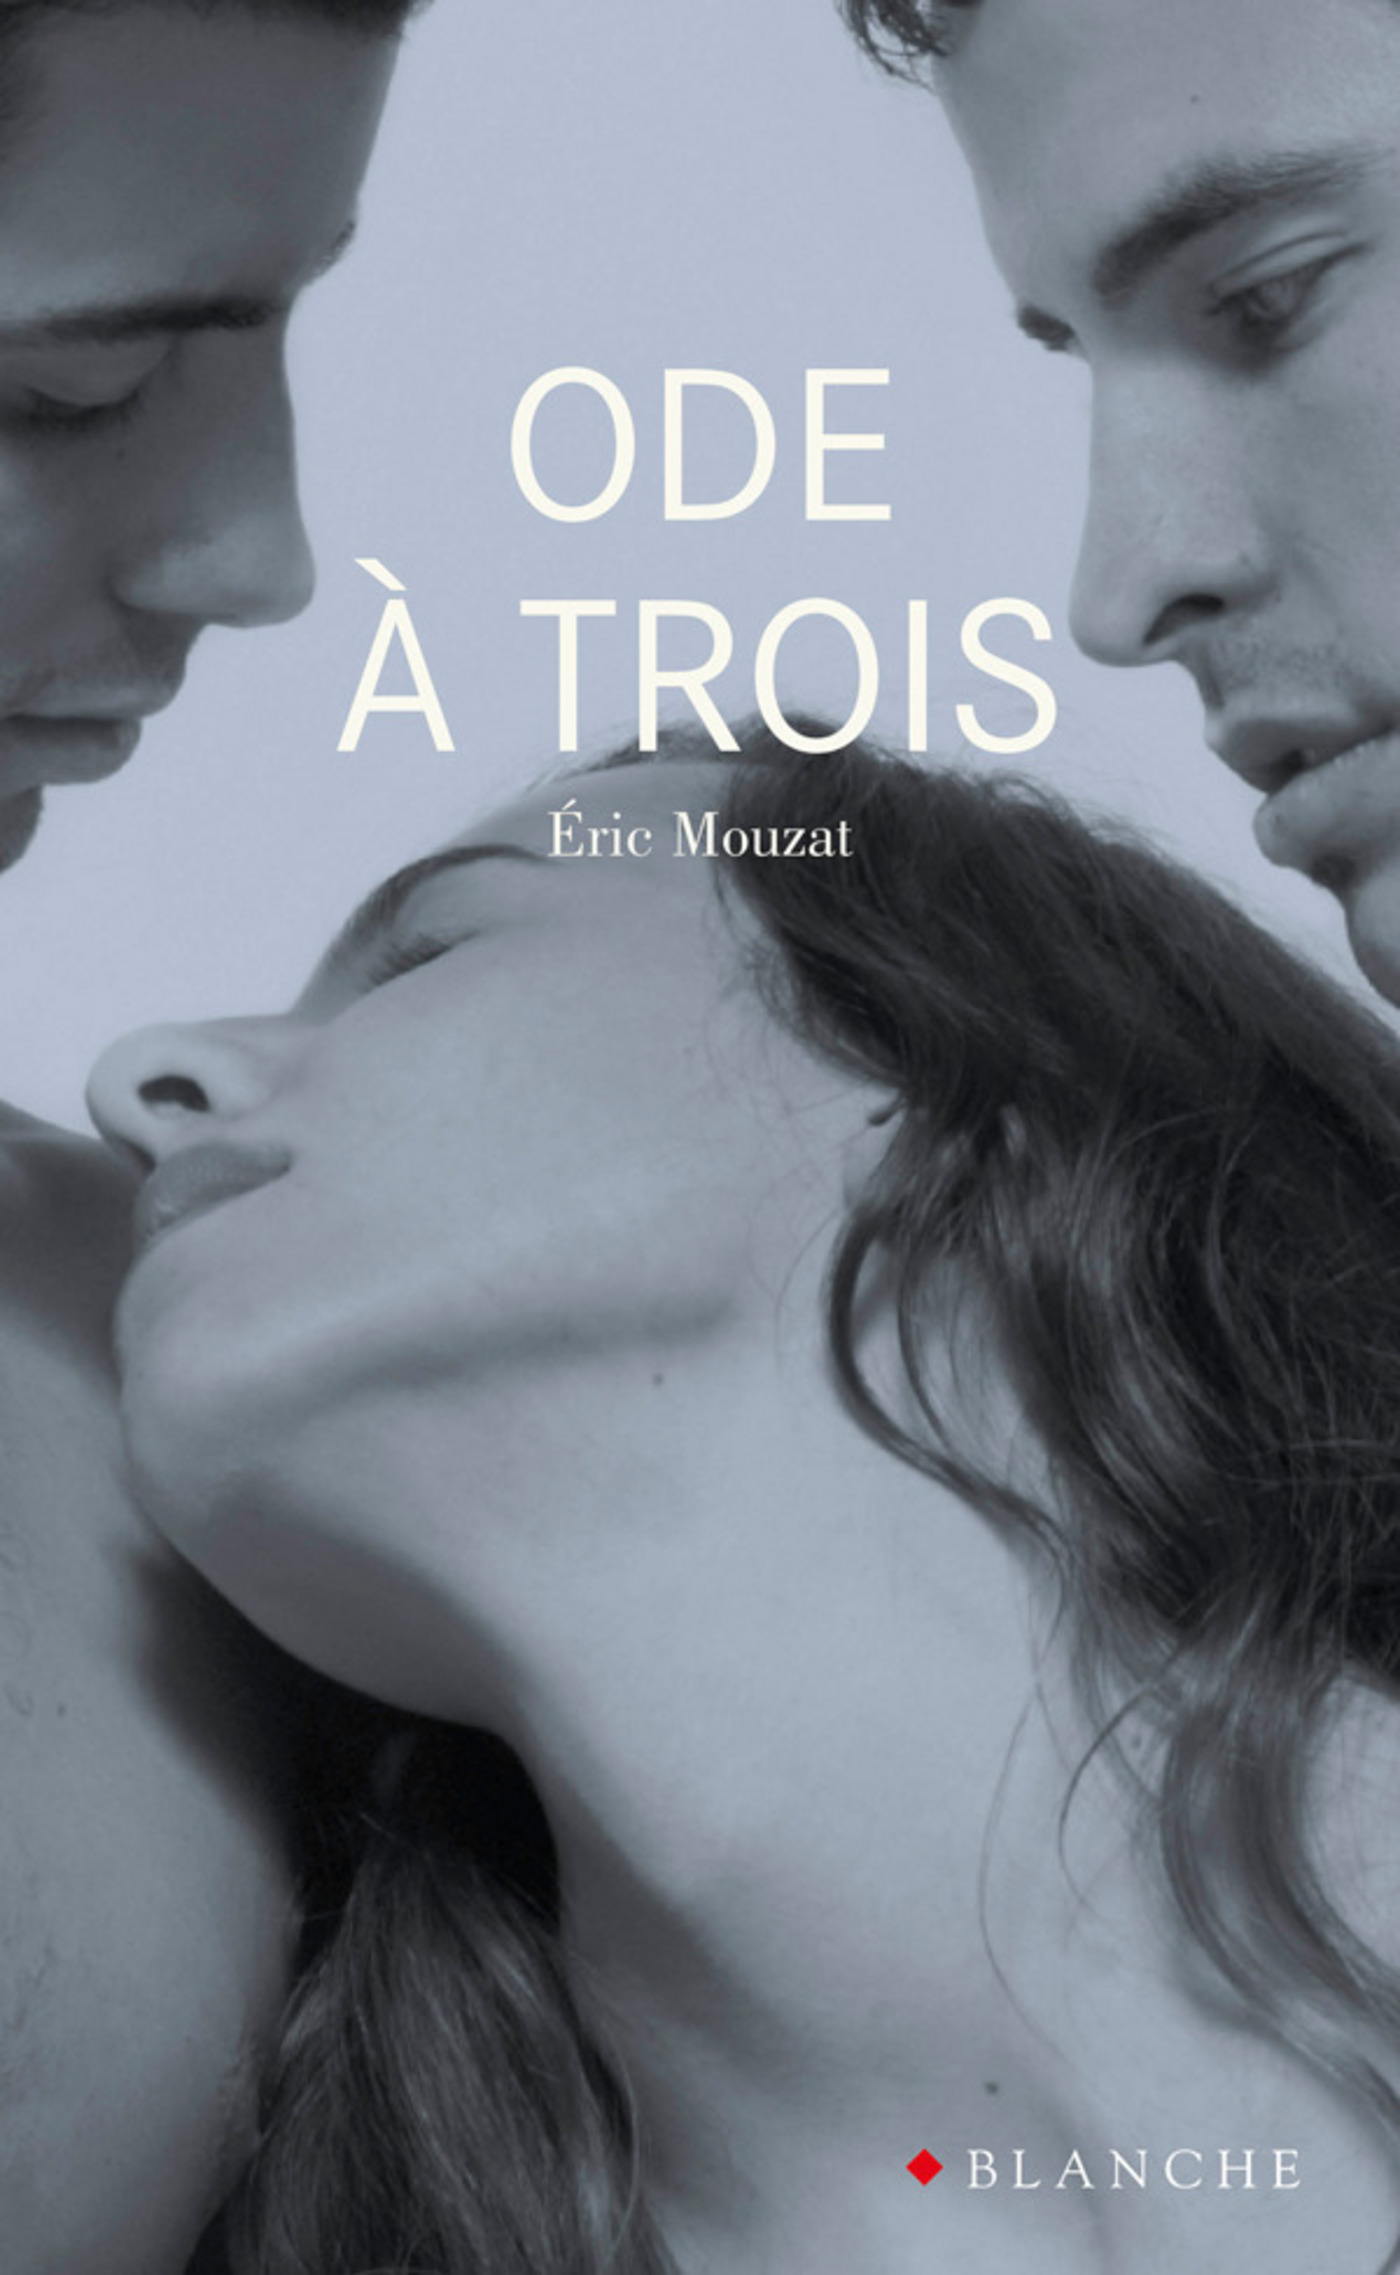 Ode a trois (ebook)